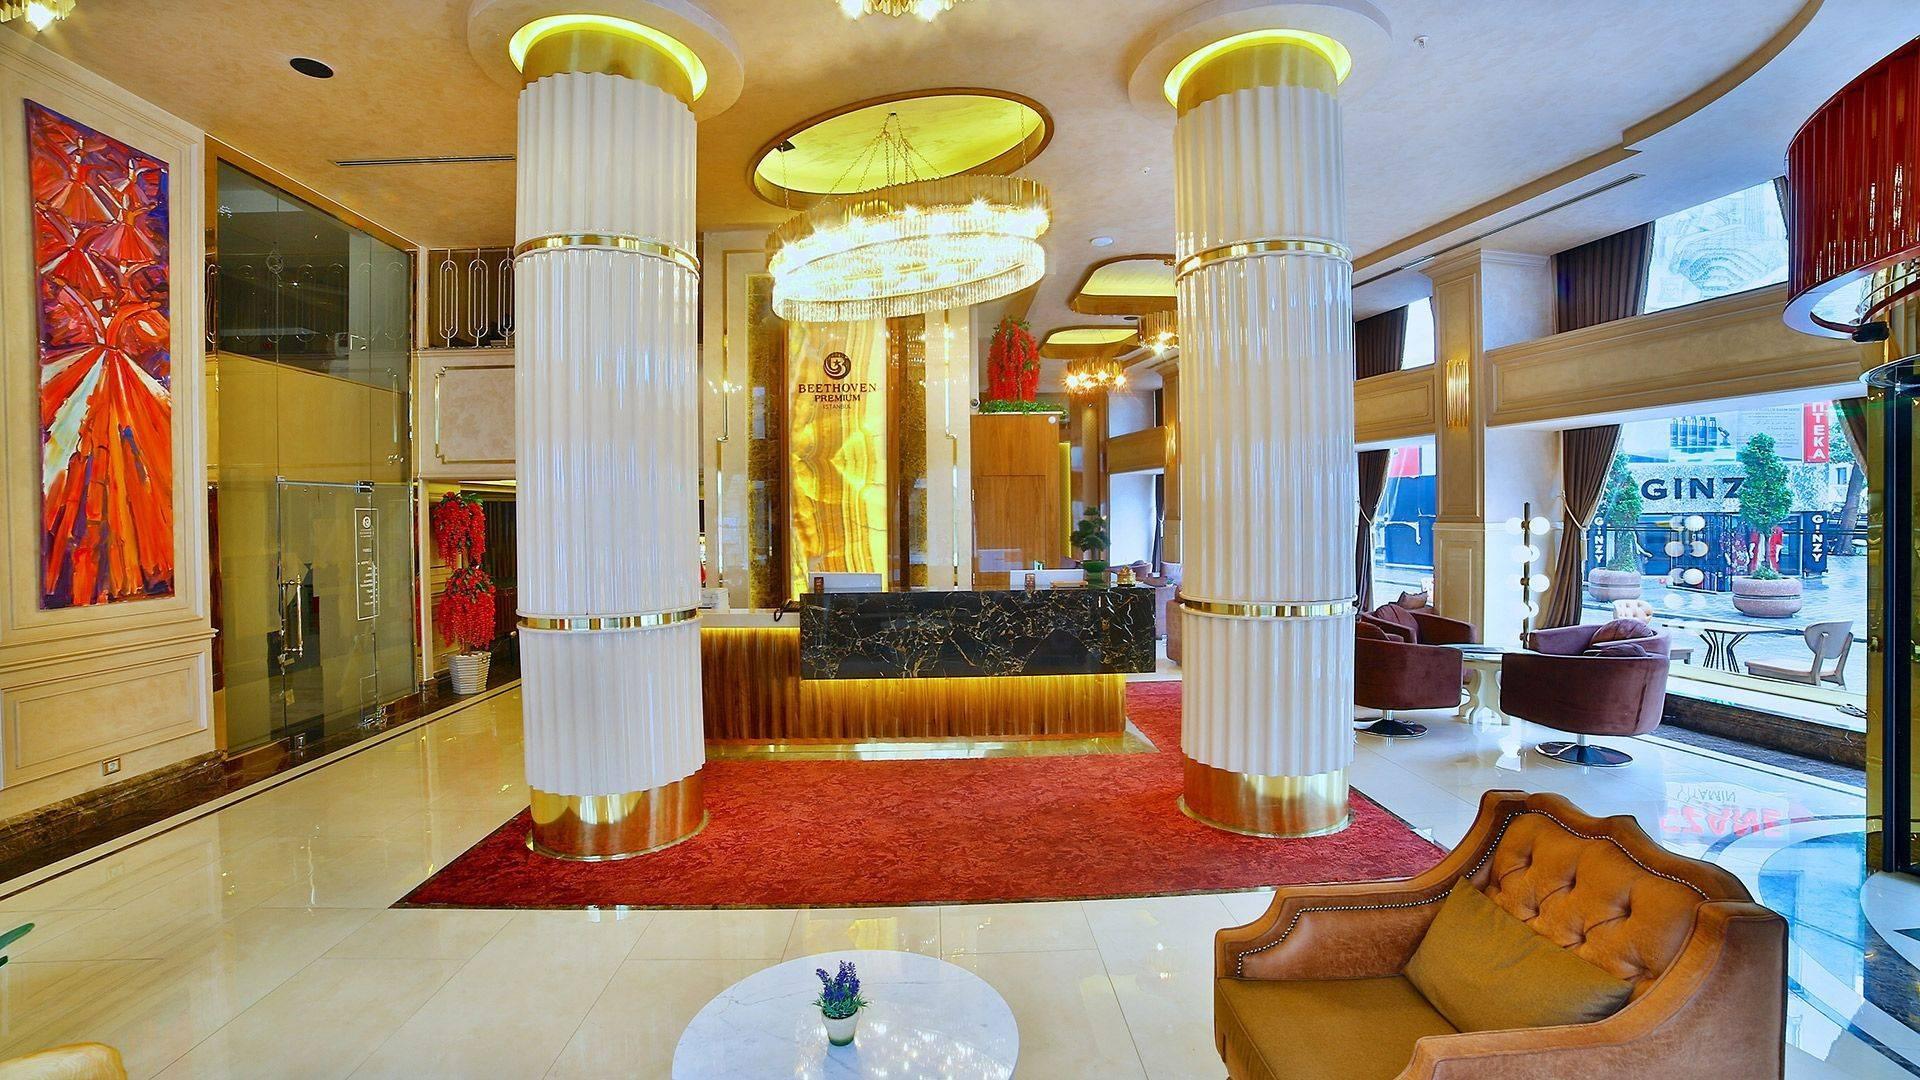 Beethoven Premium Otel, İstanbul, Laleli, 29662